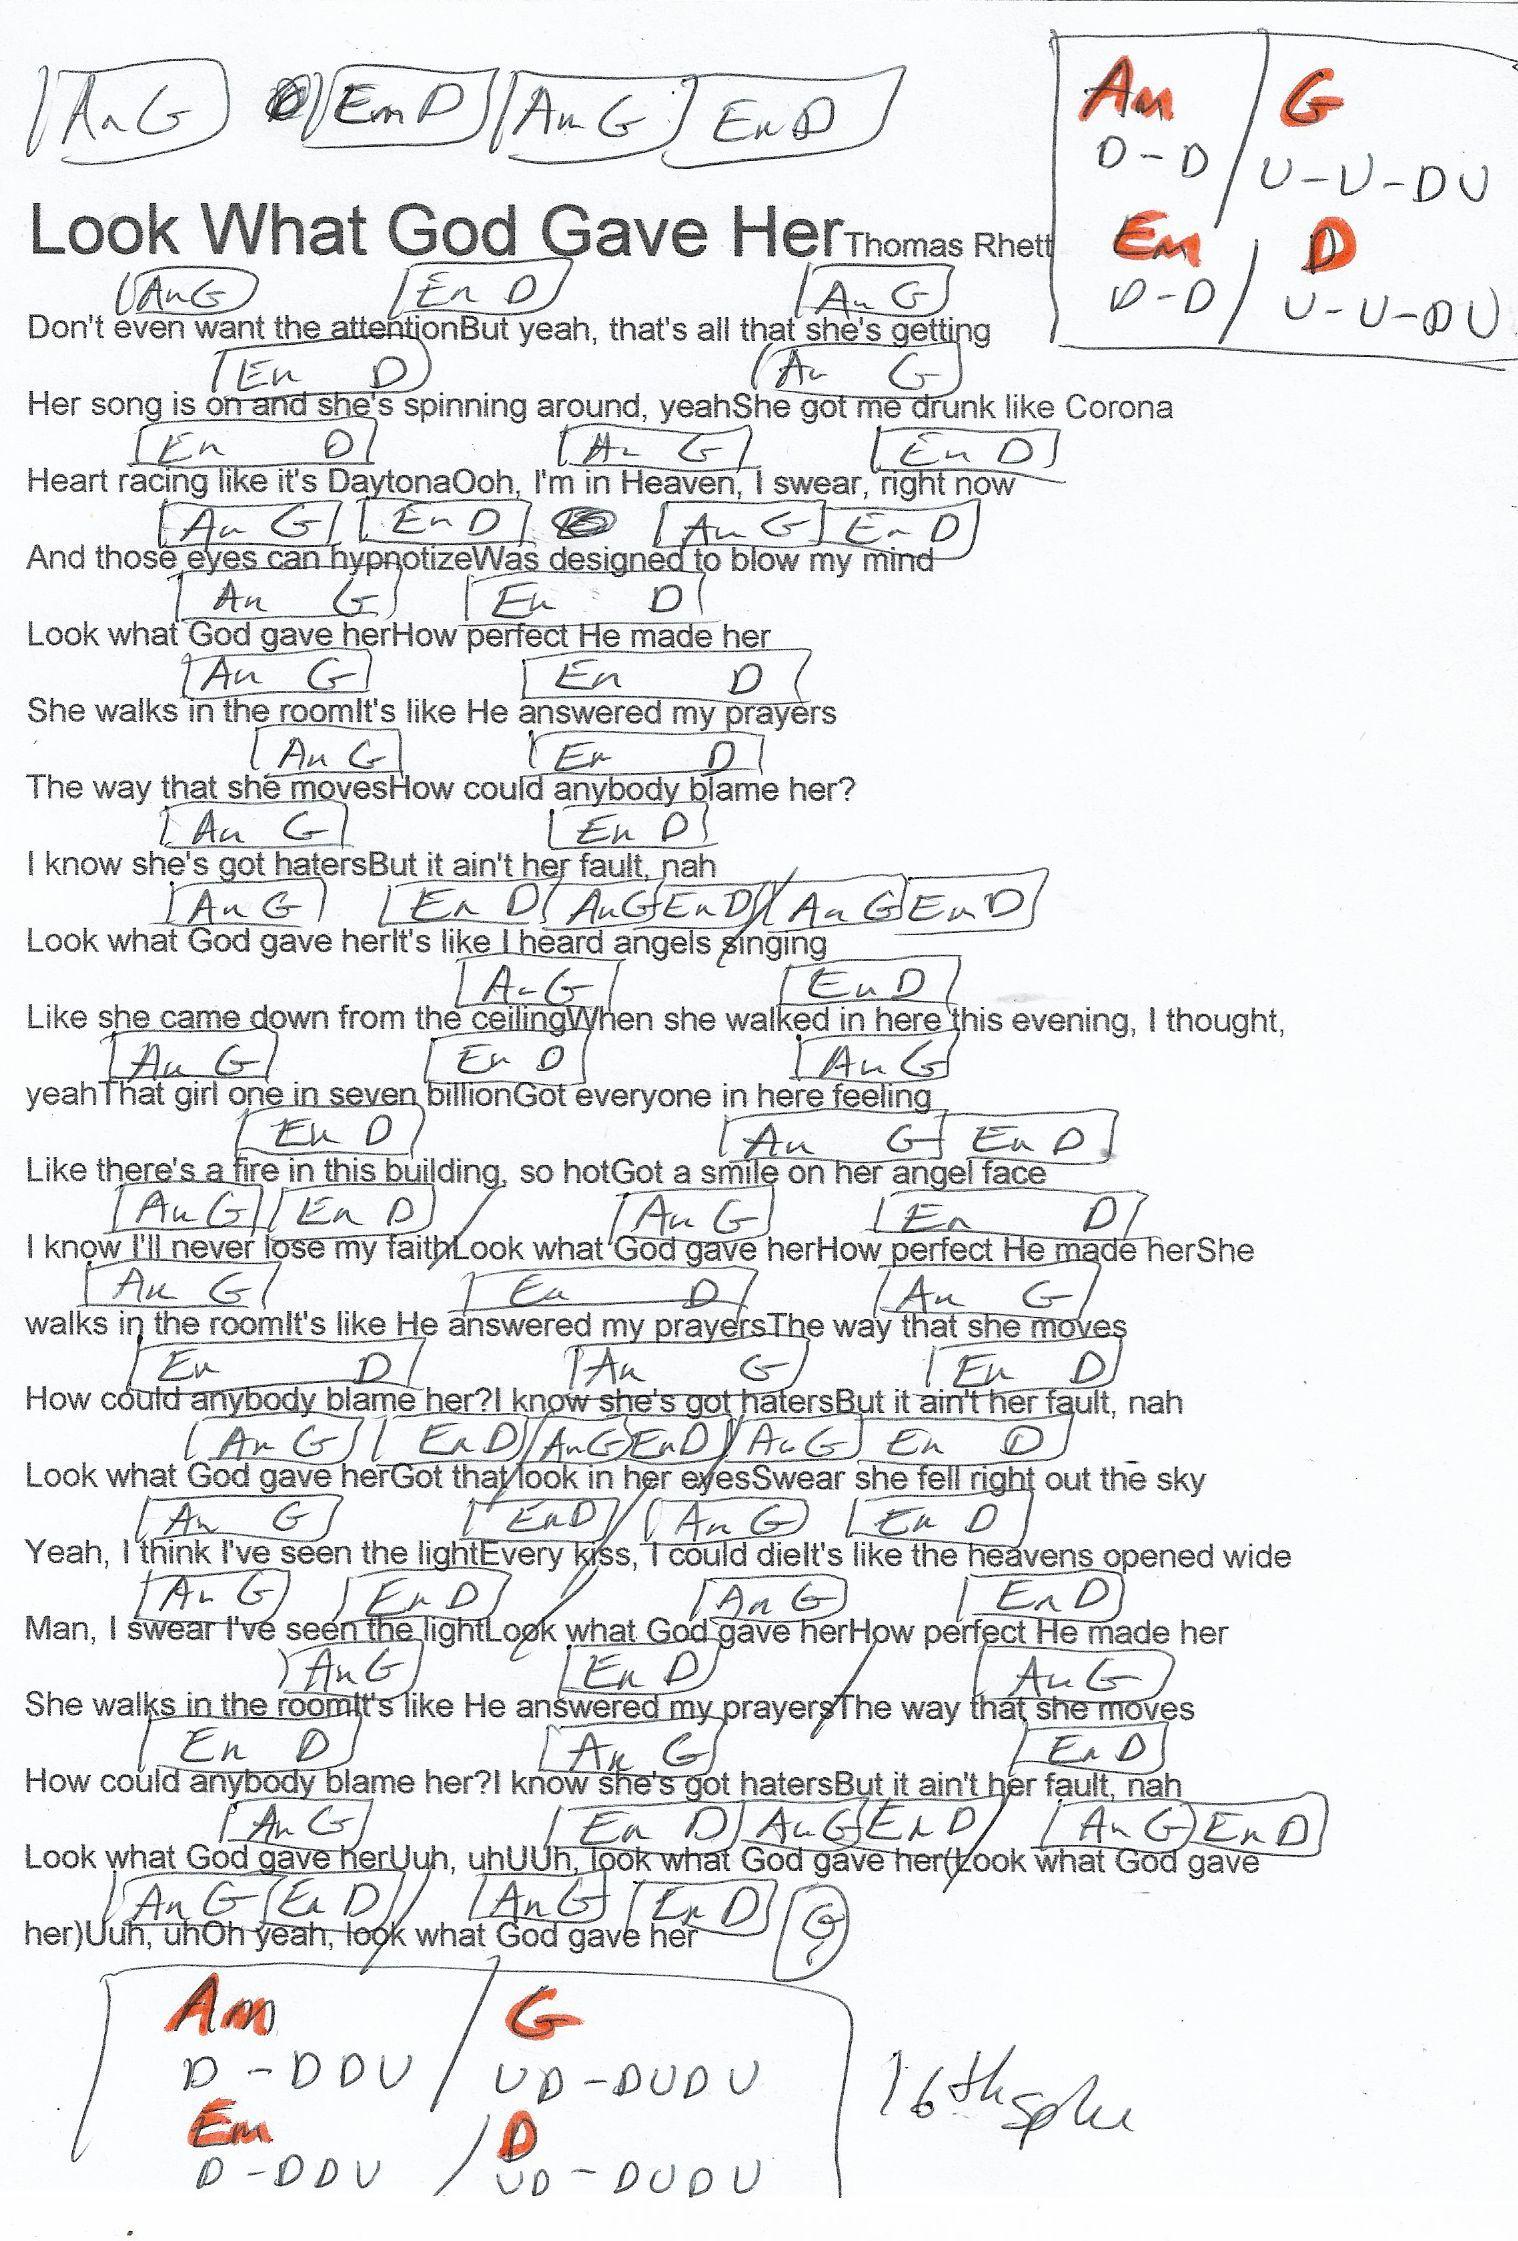 Look What God Gave Her Thomas Rhett Guitar Chord Chart Ukelele Chords Ukulele Songs Guitar Chord Chart Thomas Rhett